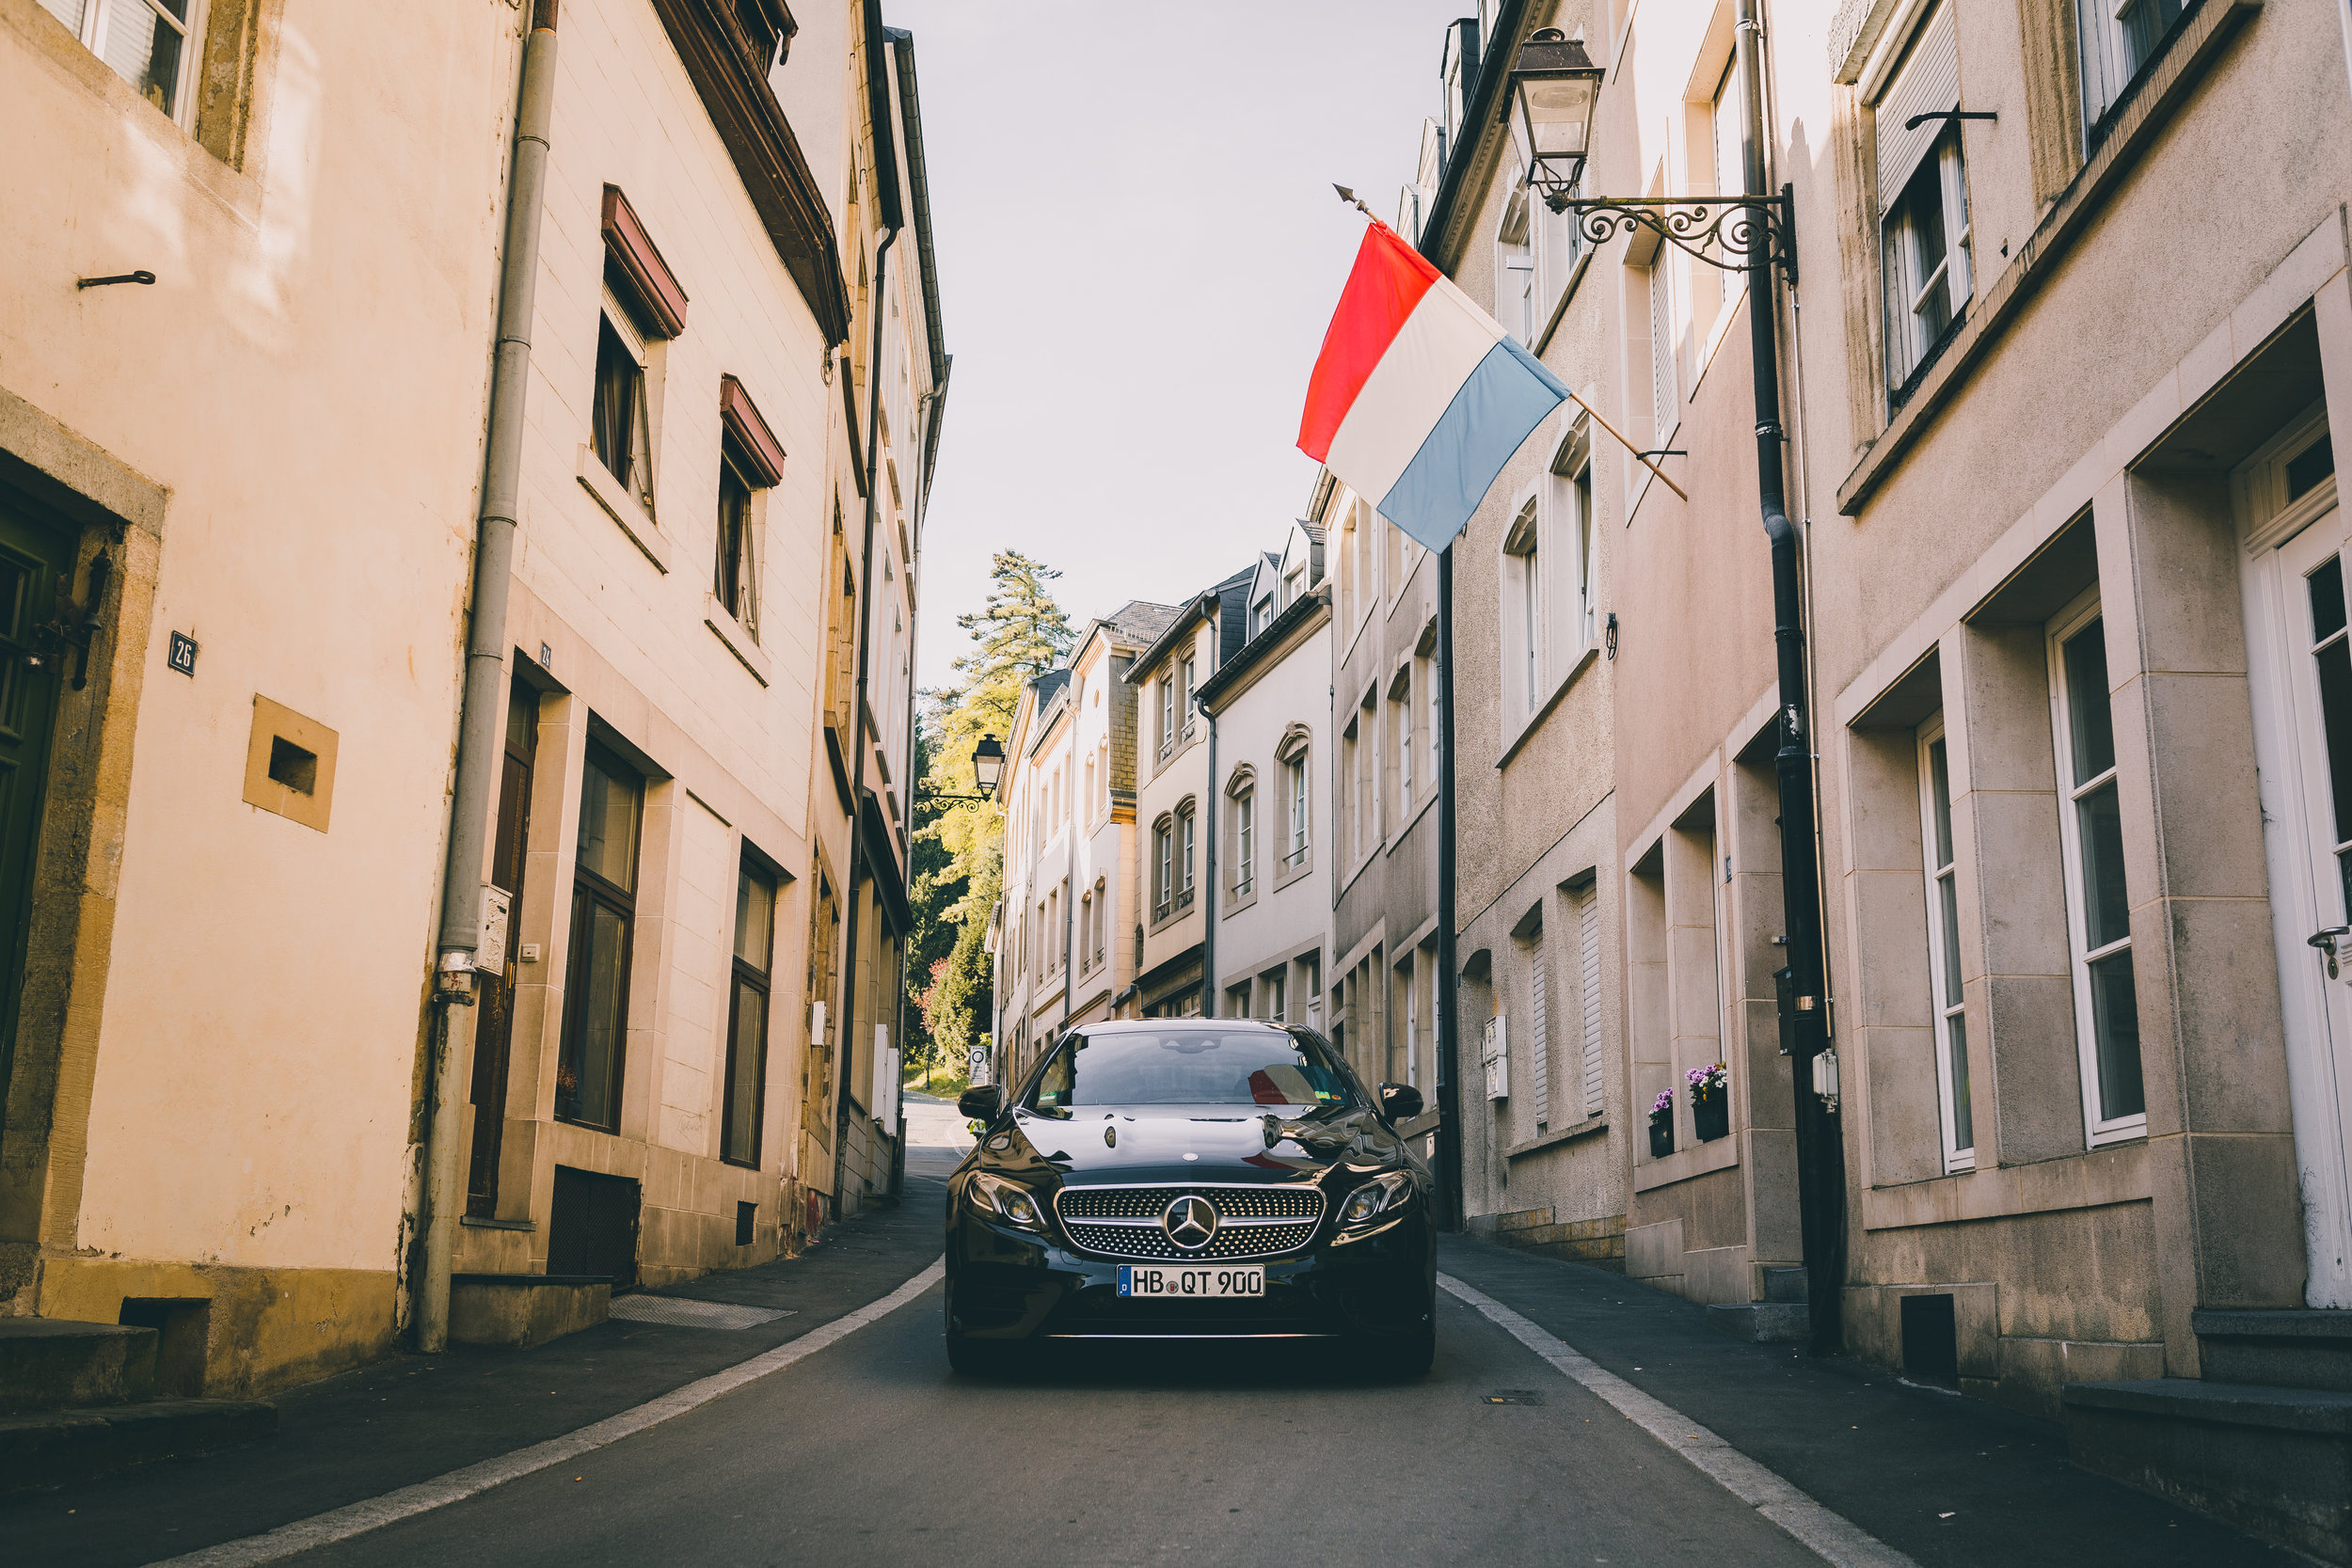 luxembourgmercedes-2 copy 2.jpg